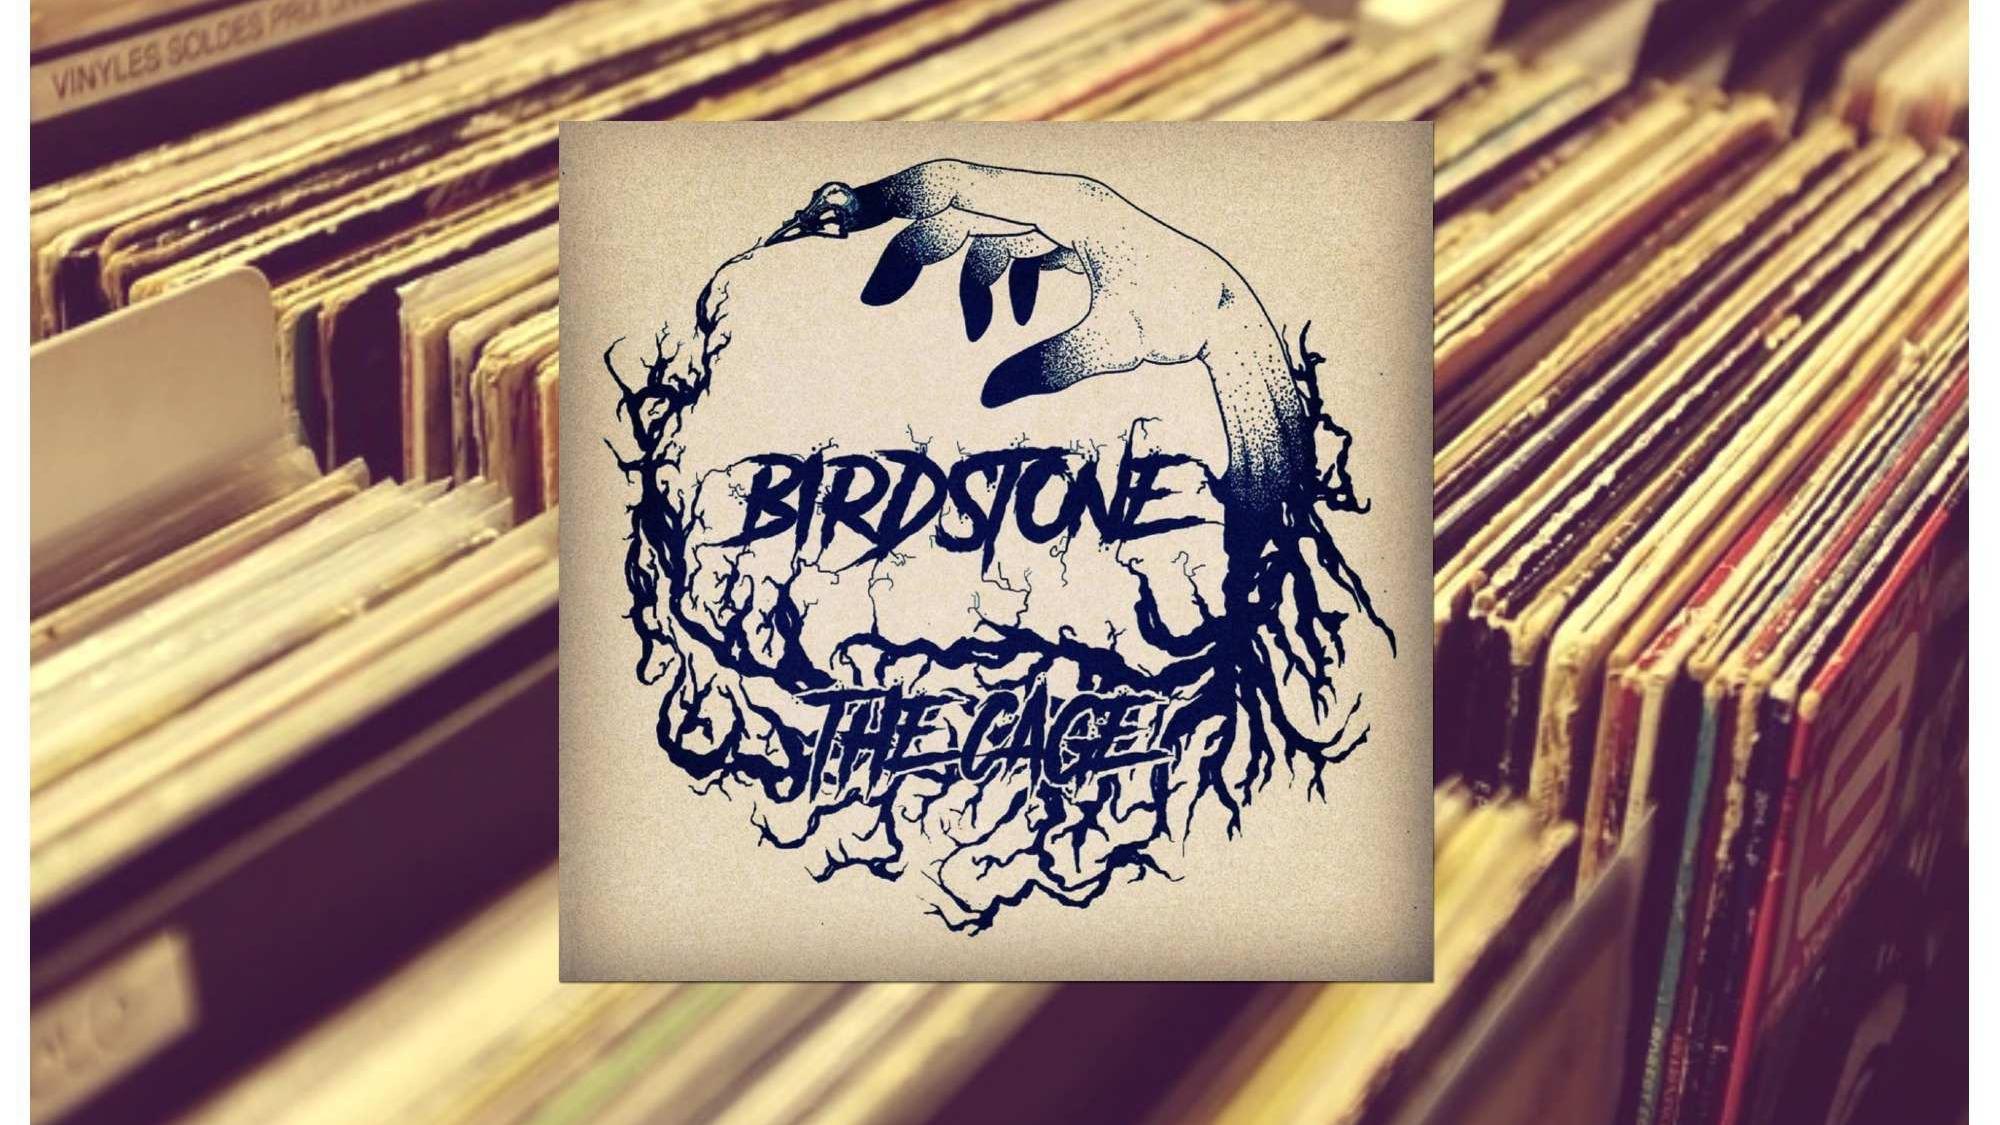 Birdstone, The Cage [Le Disque de la Semaine]